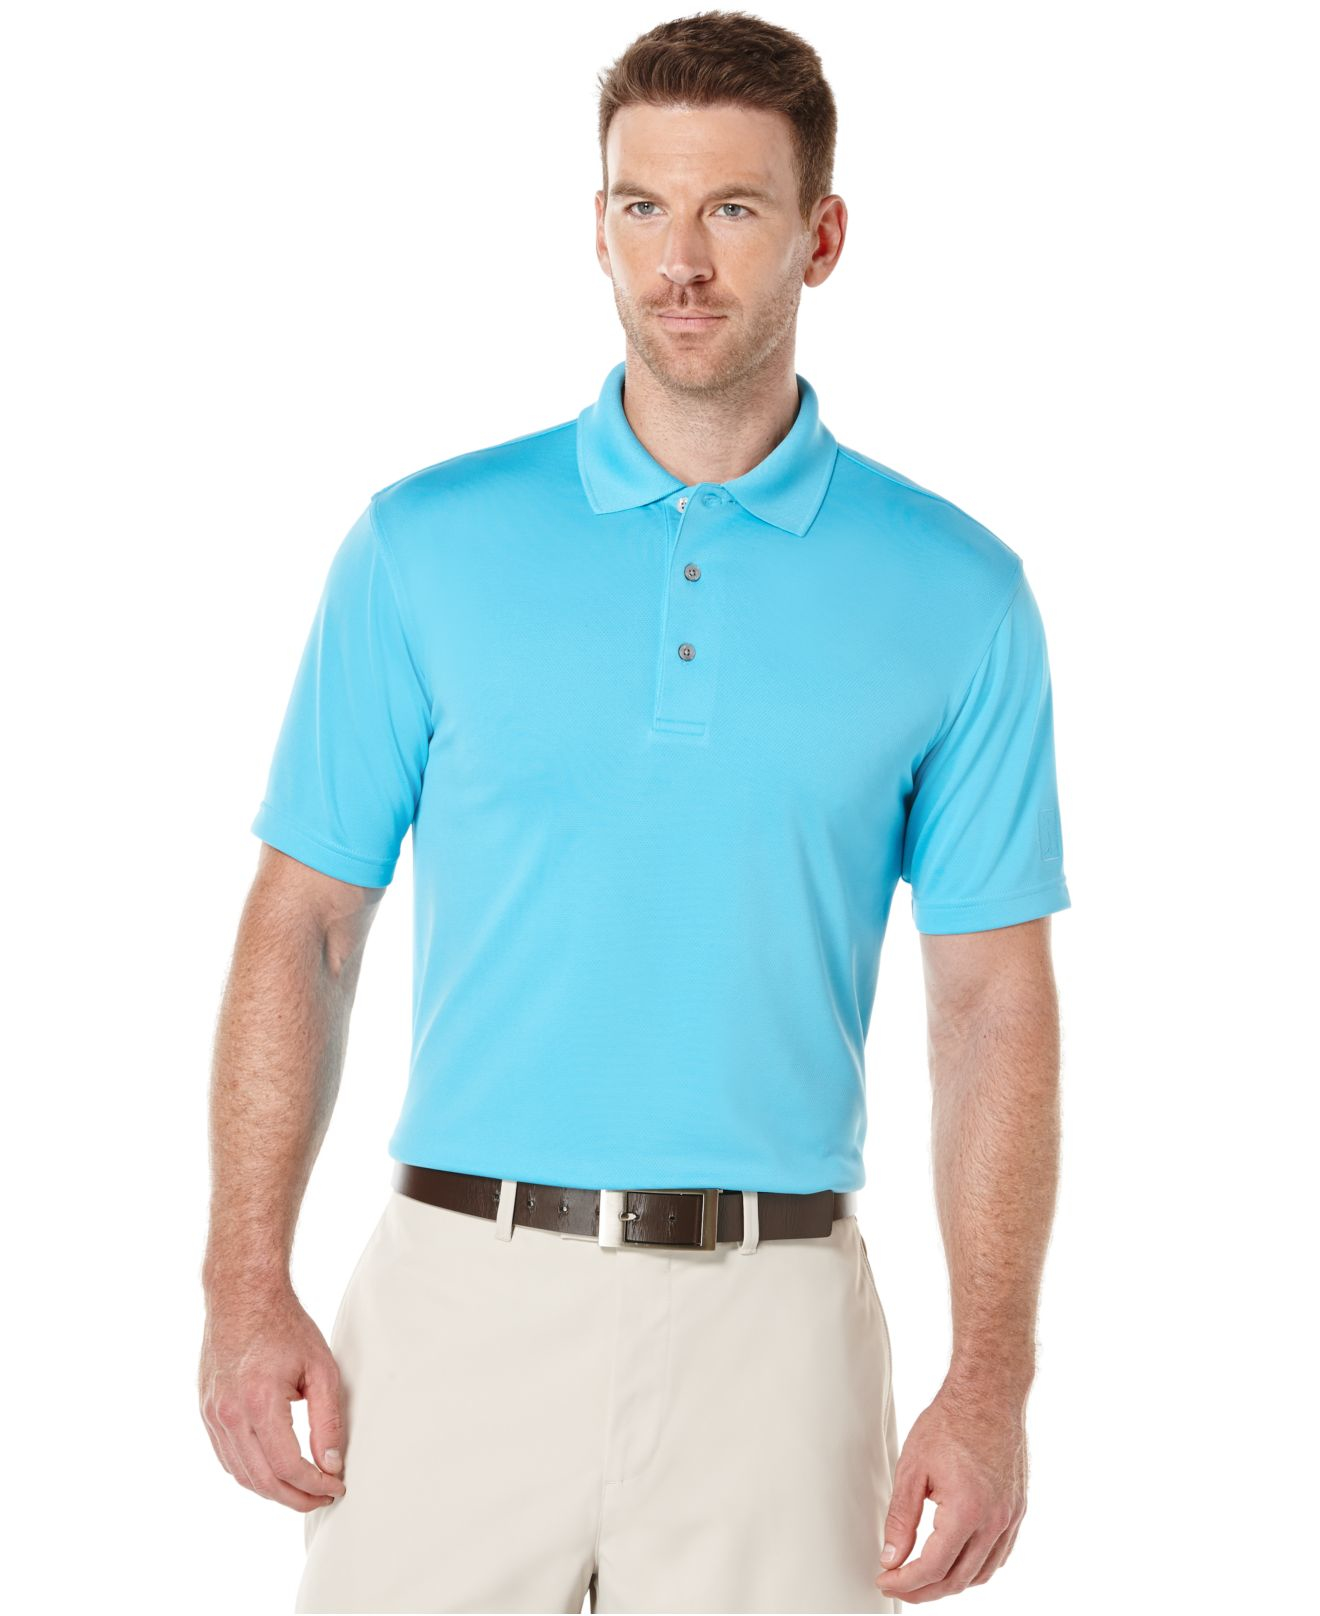 pga tour men u0026 39 s big  u0026 tall airflux solid golf polo in blue